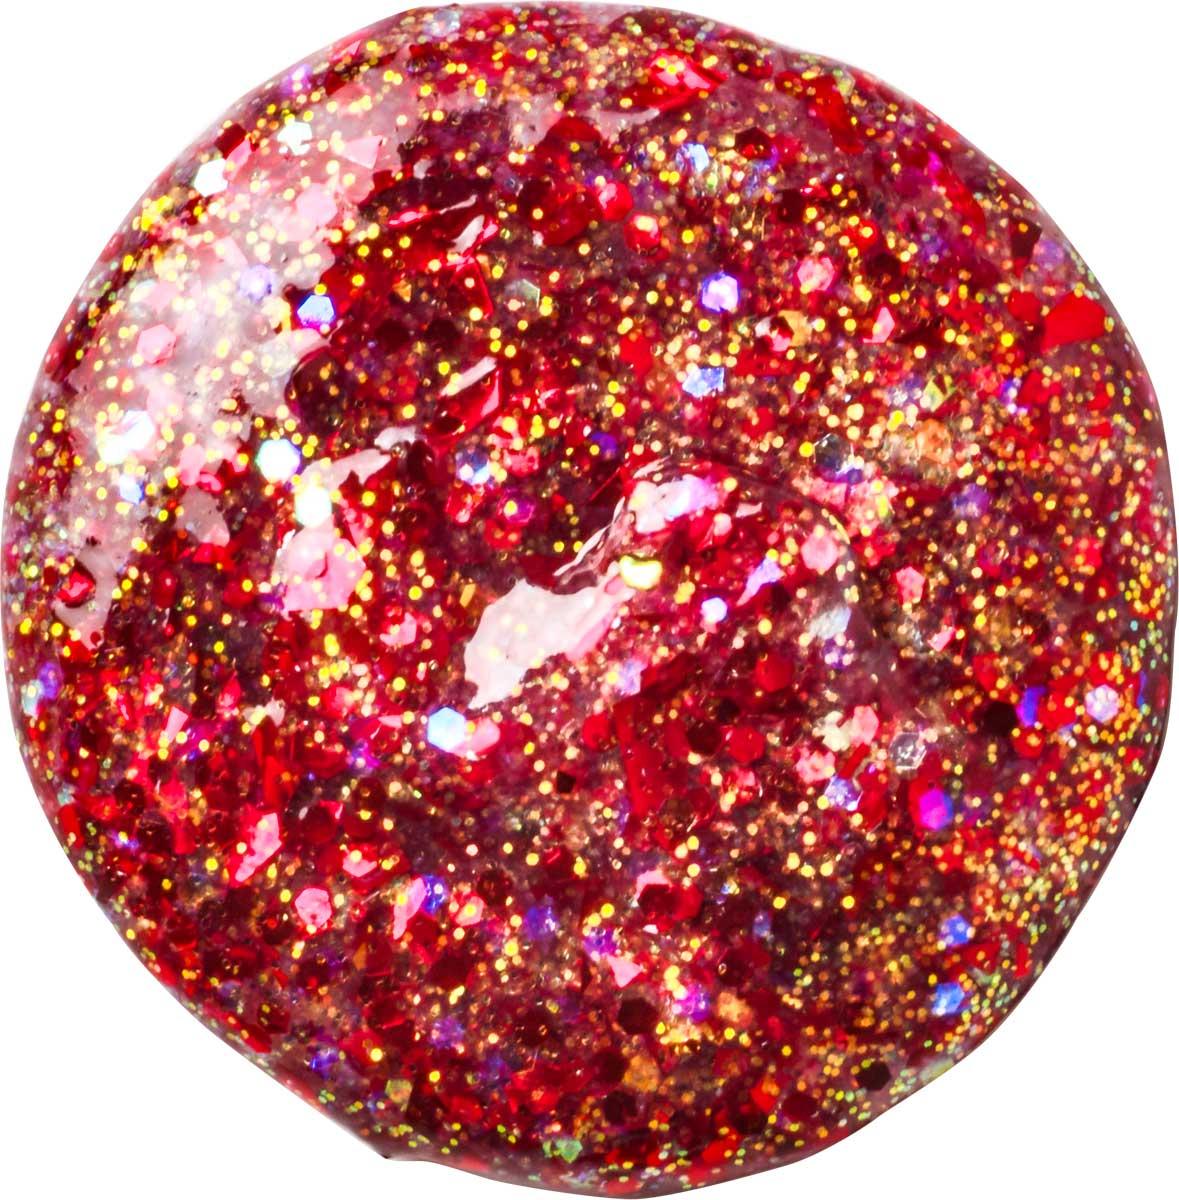 FolkArt ® Glitterific™ Acrylic Paint - Red, 2 oz.